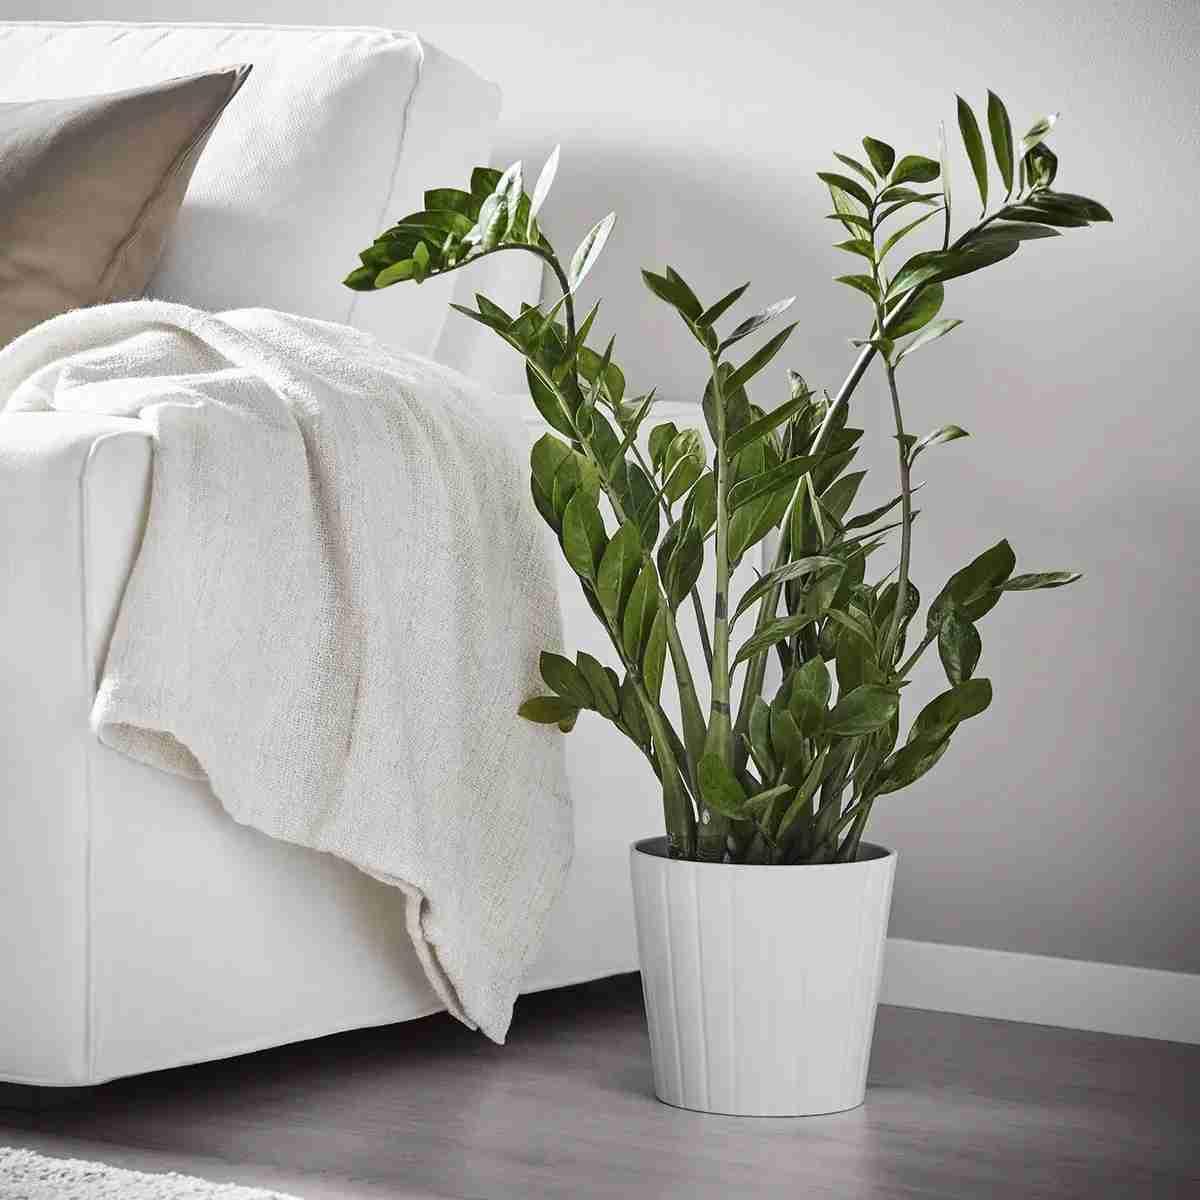 6 Plantas de invierno para decorar tu hogar 14